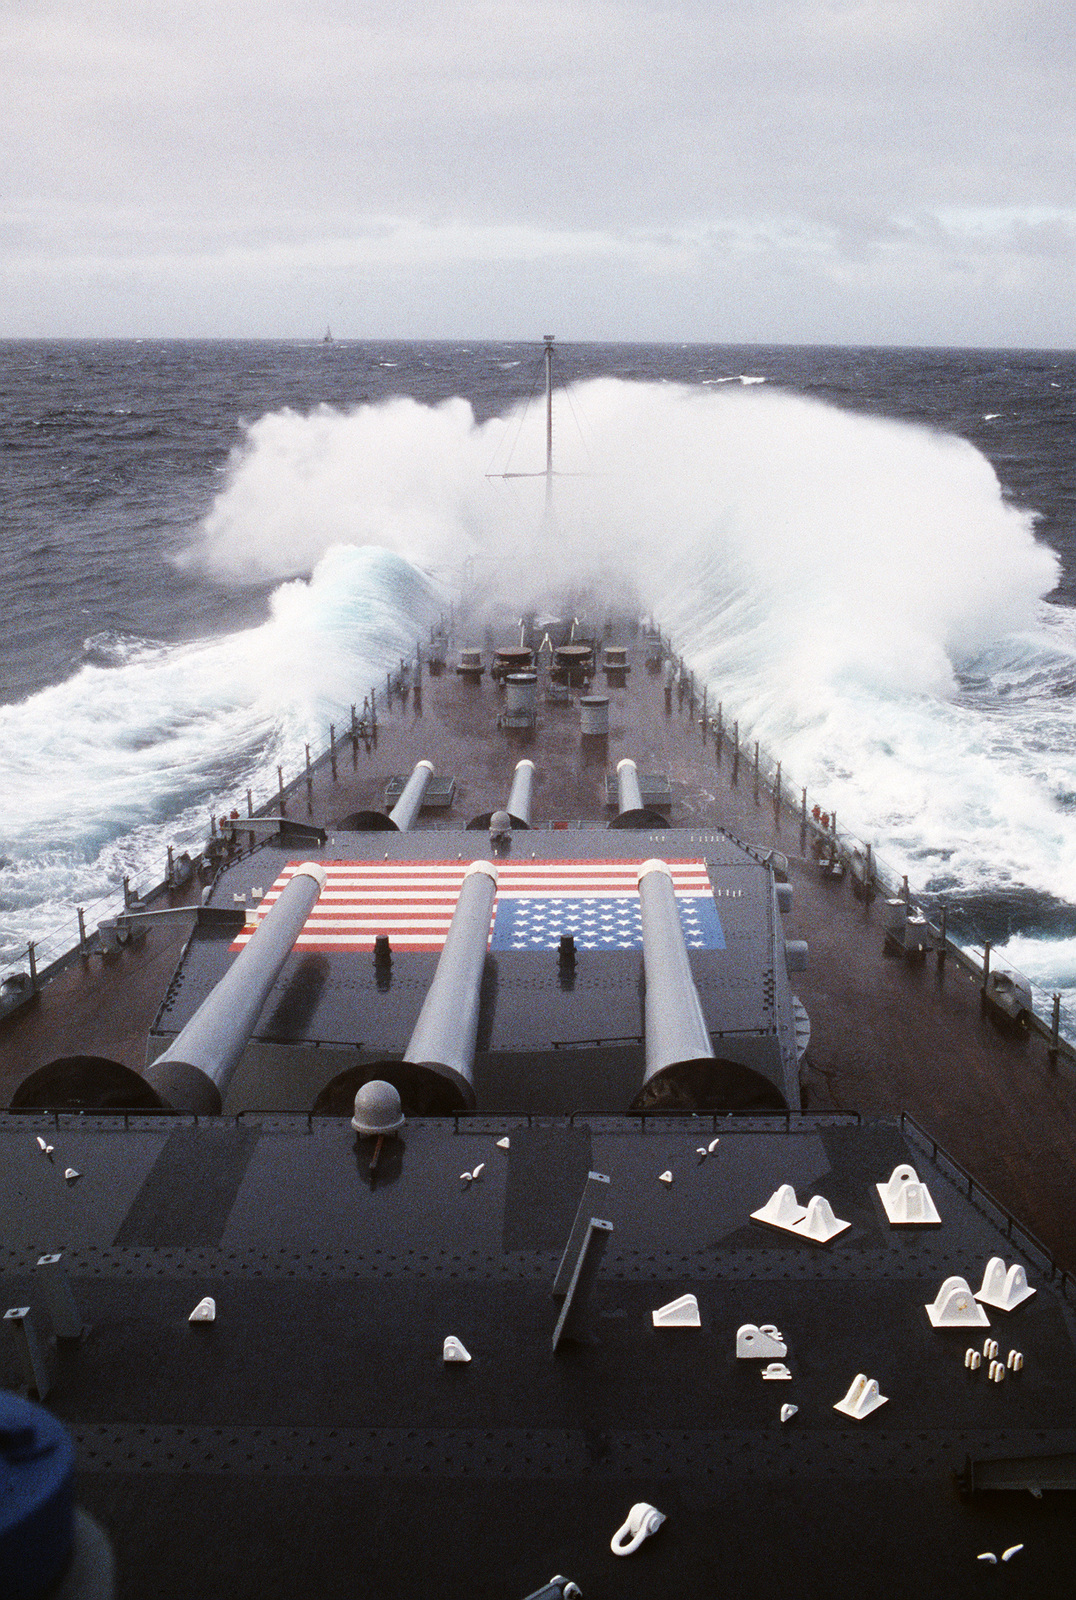 The bow of the battleship USS IOWA (BB 61) crashes through heavy